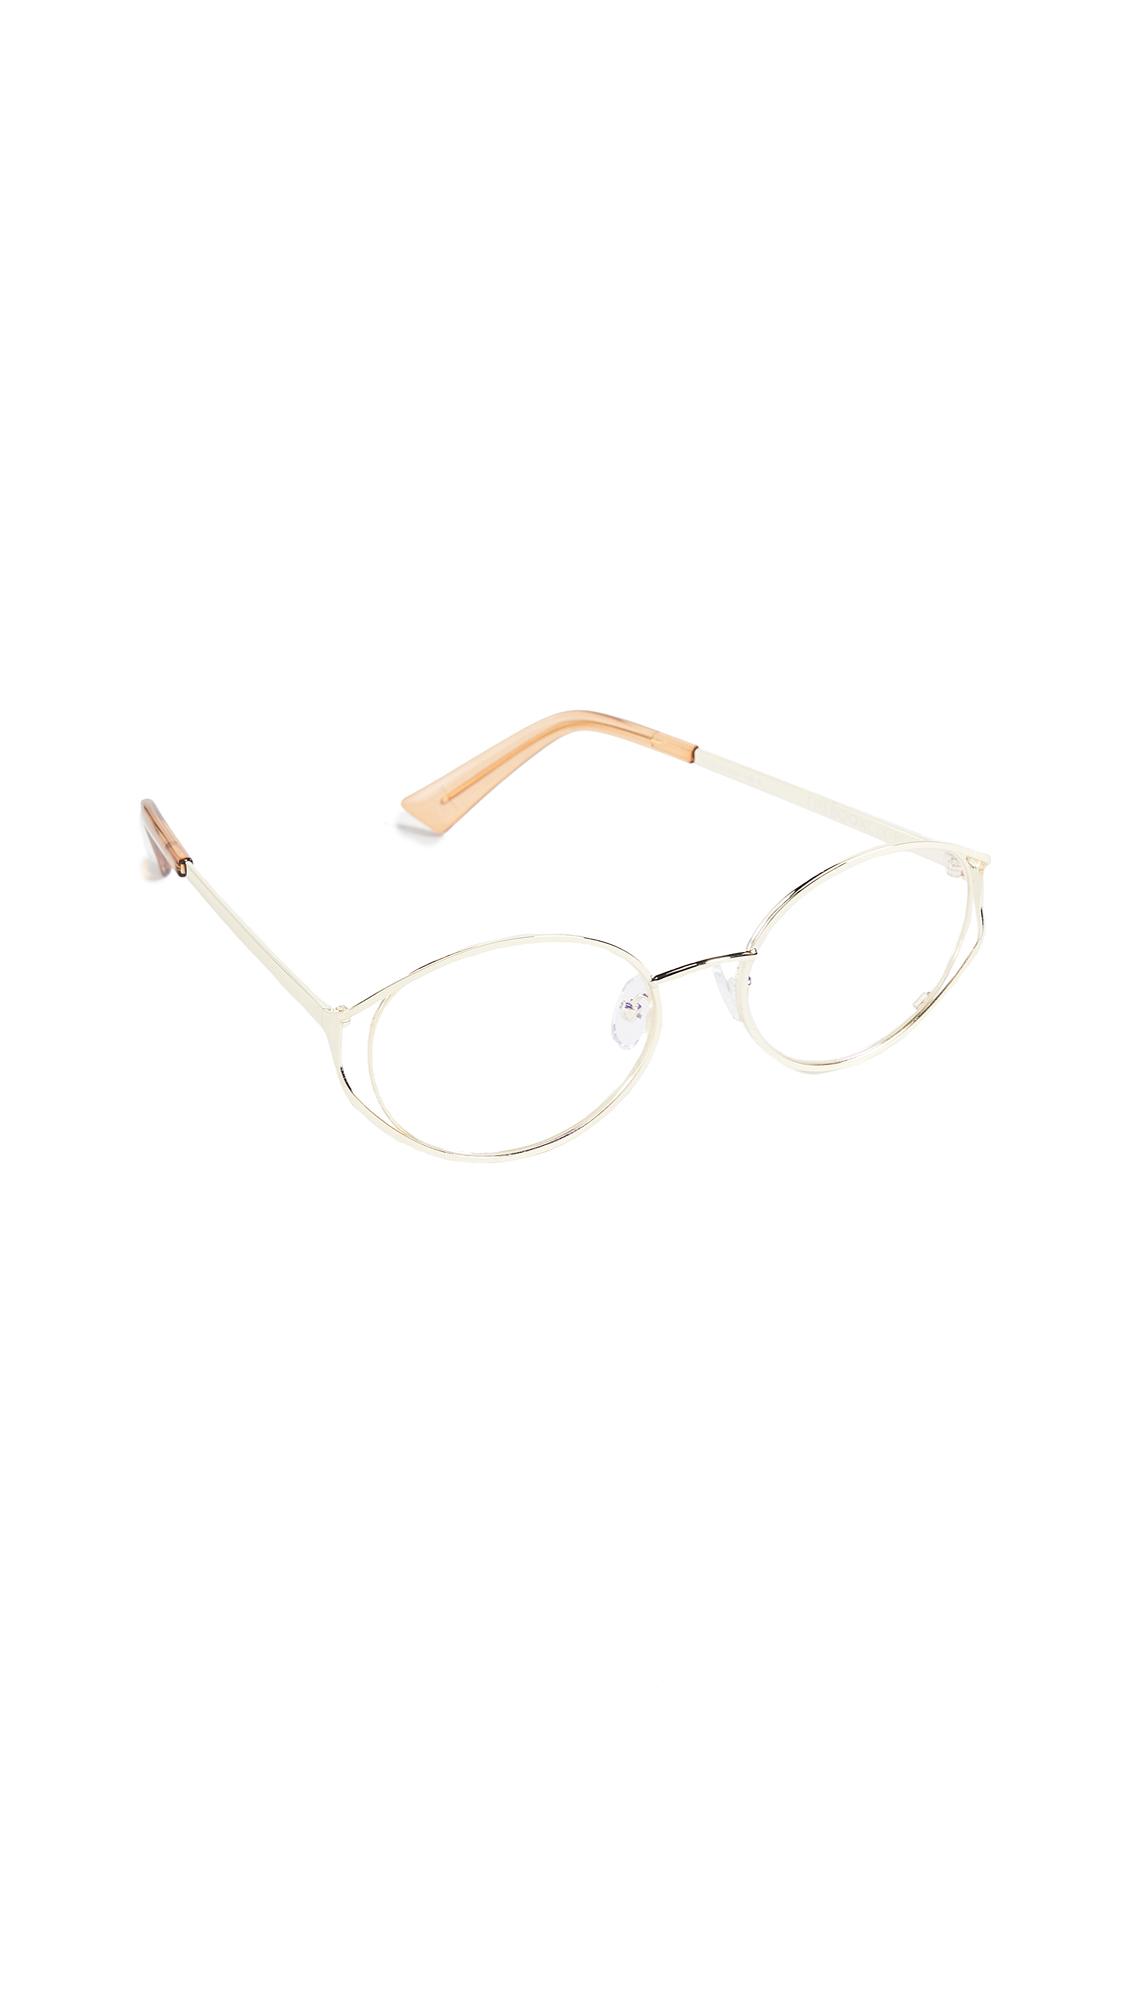 THE BOOK CLUB Spatula Glasses in Gold/Clay